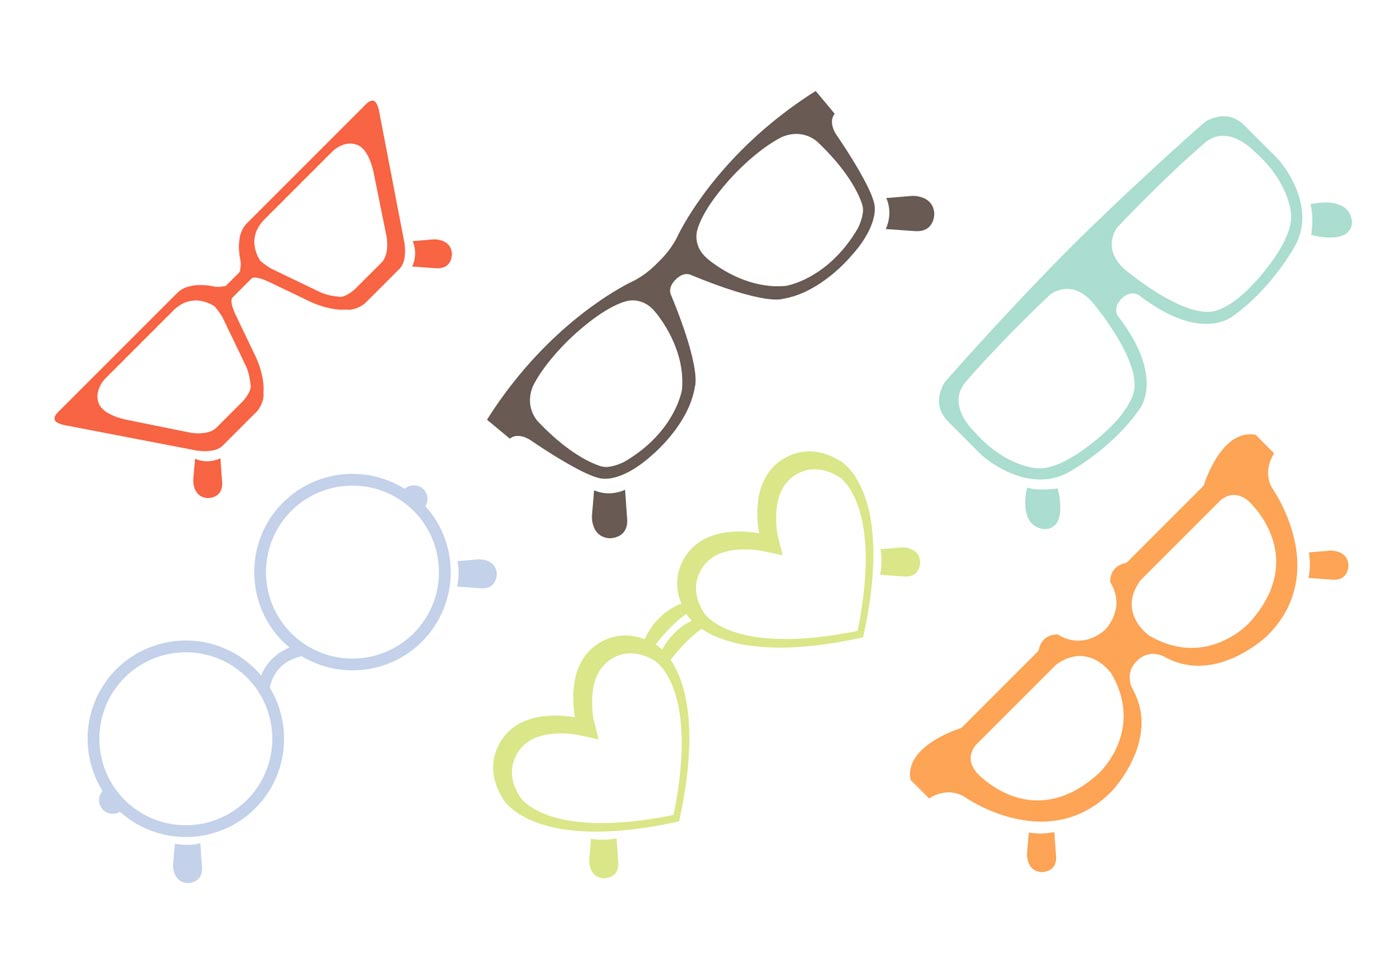 377a9a3087f Heart Shaped Sunglasses Free Vector Art - (16364 Free Downloads)